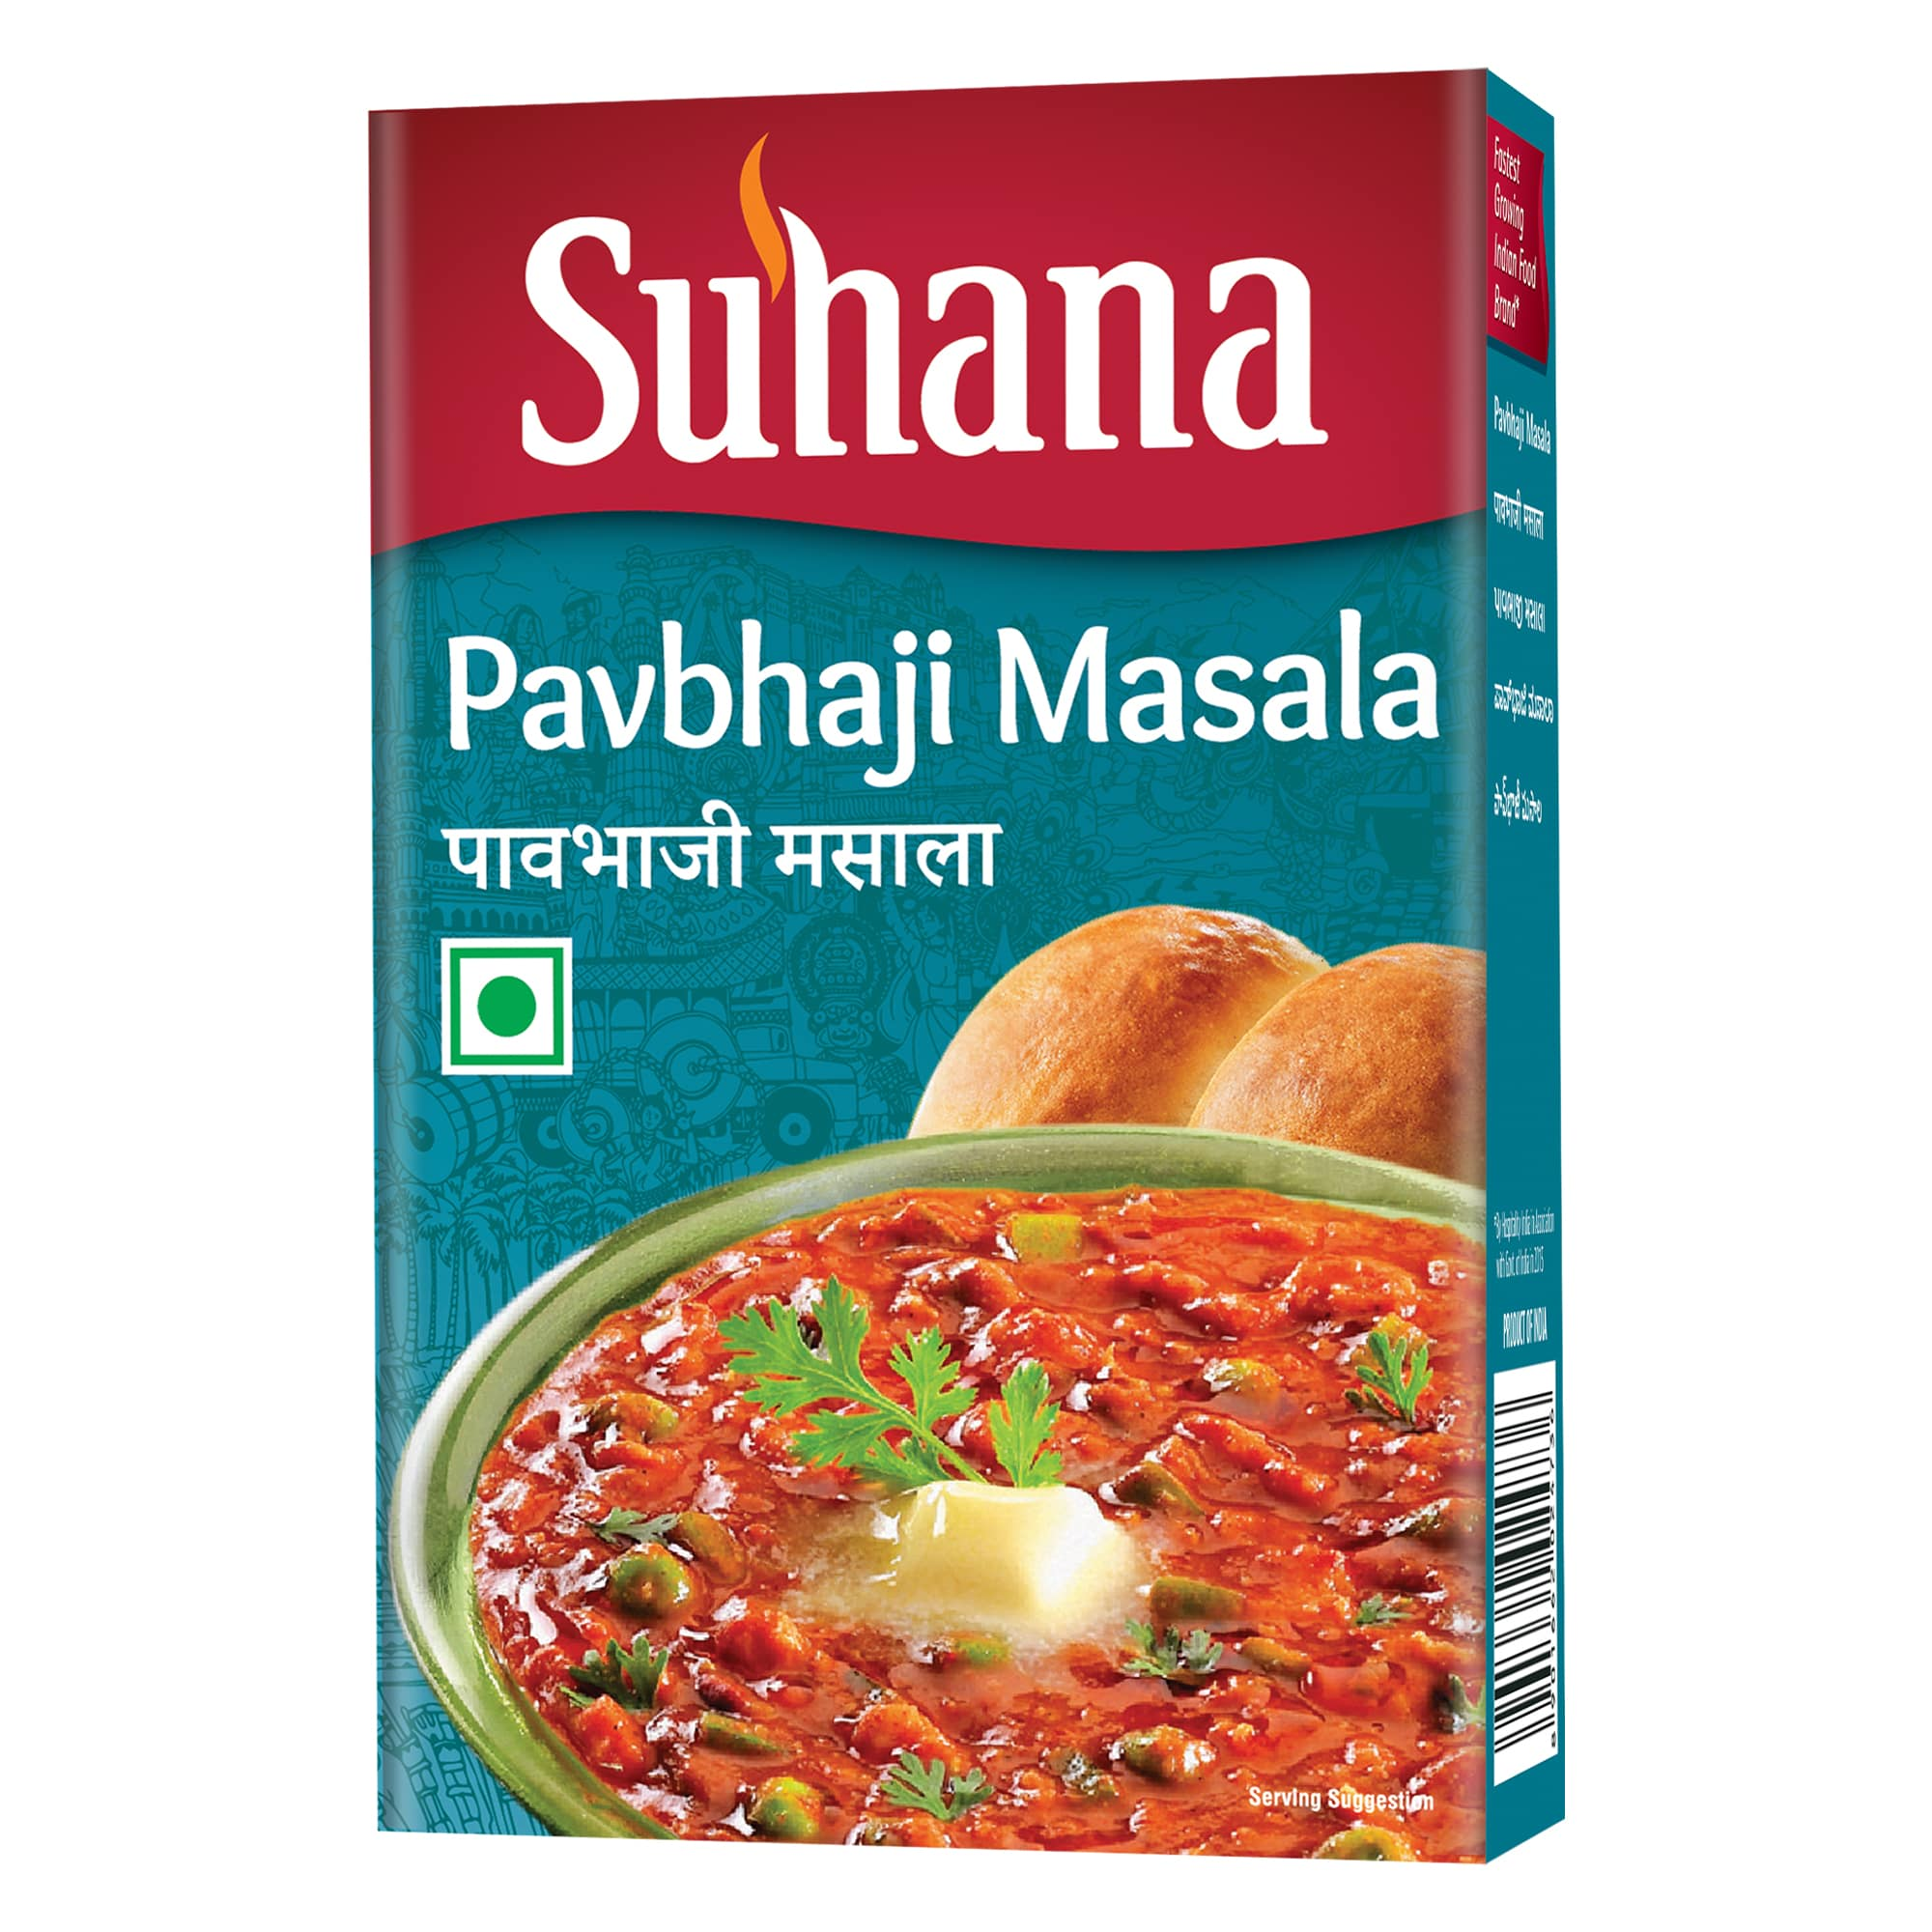 Suhana Pavbhaji Masala